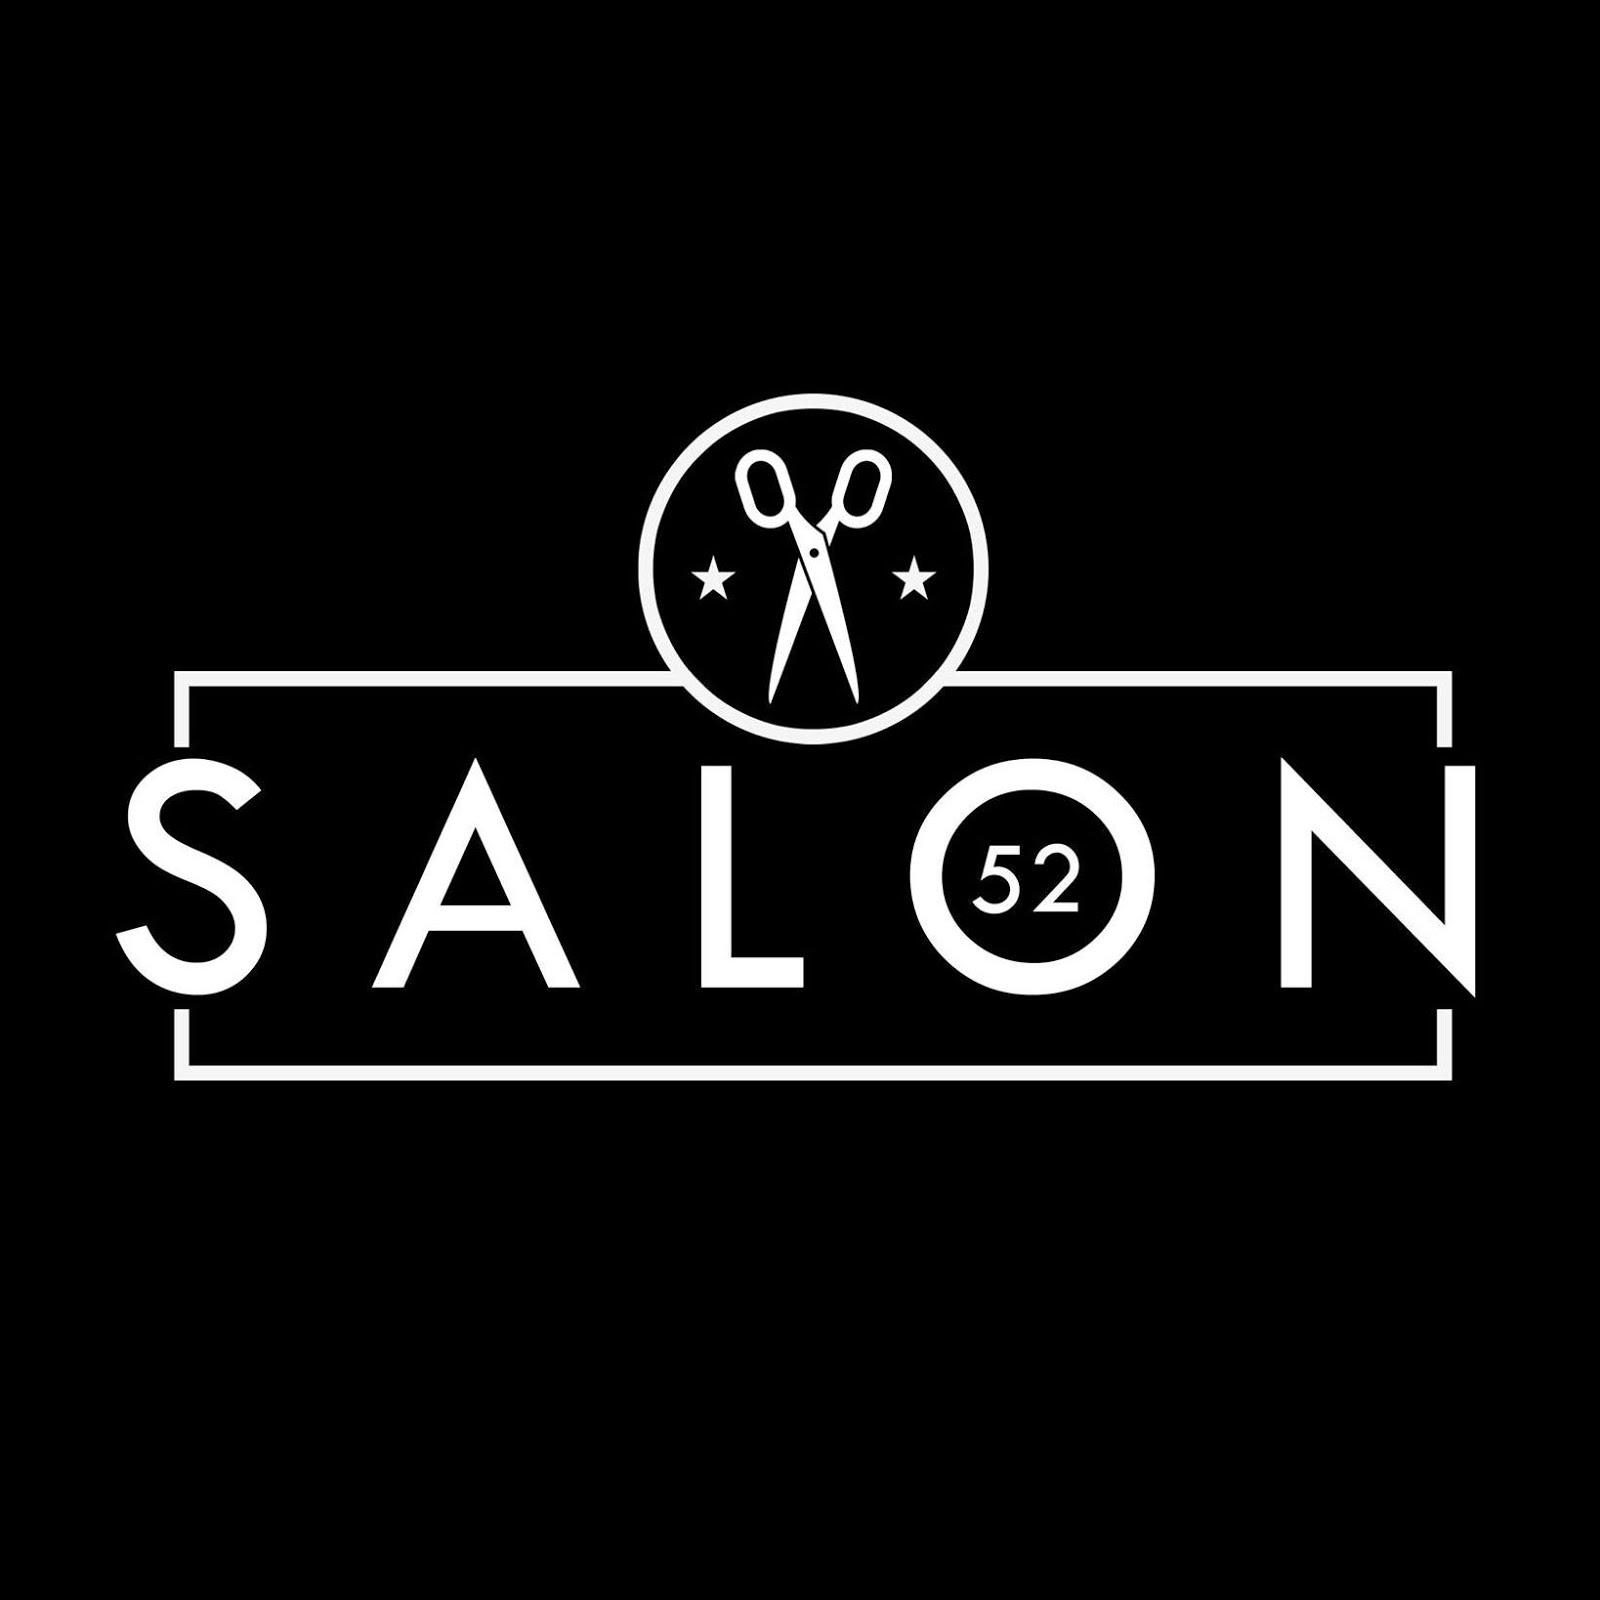 Salon52